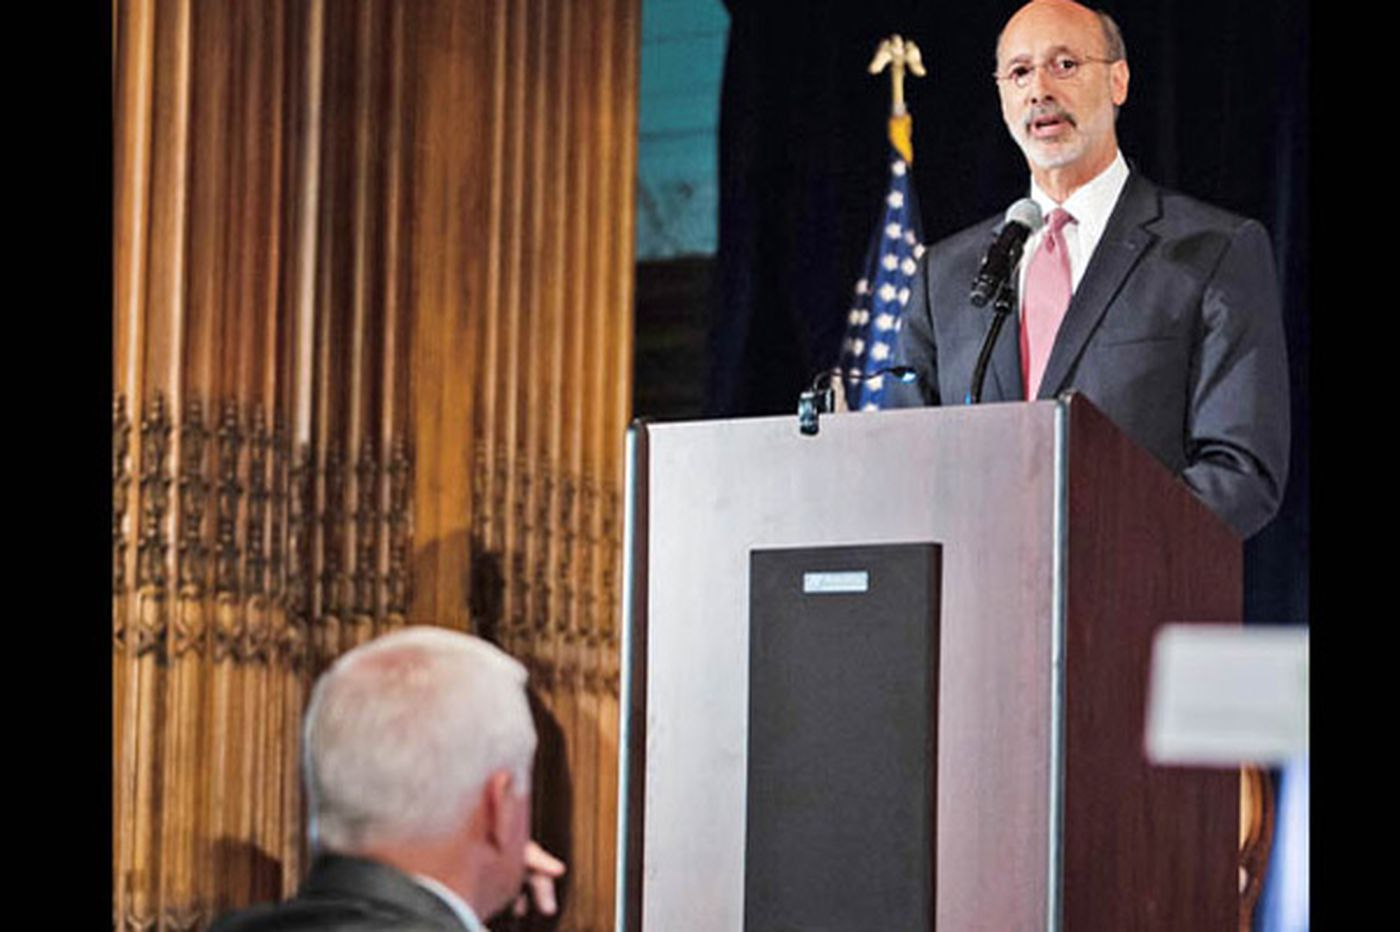 What a gas: Wolf, Corbett talk environment